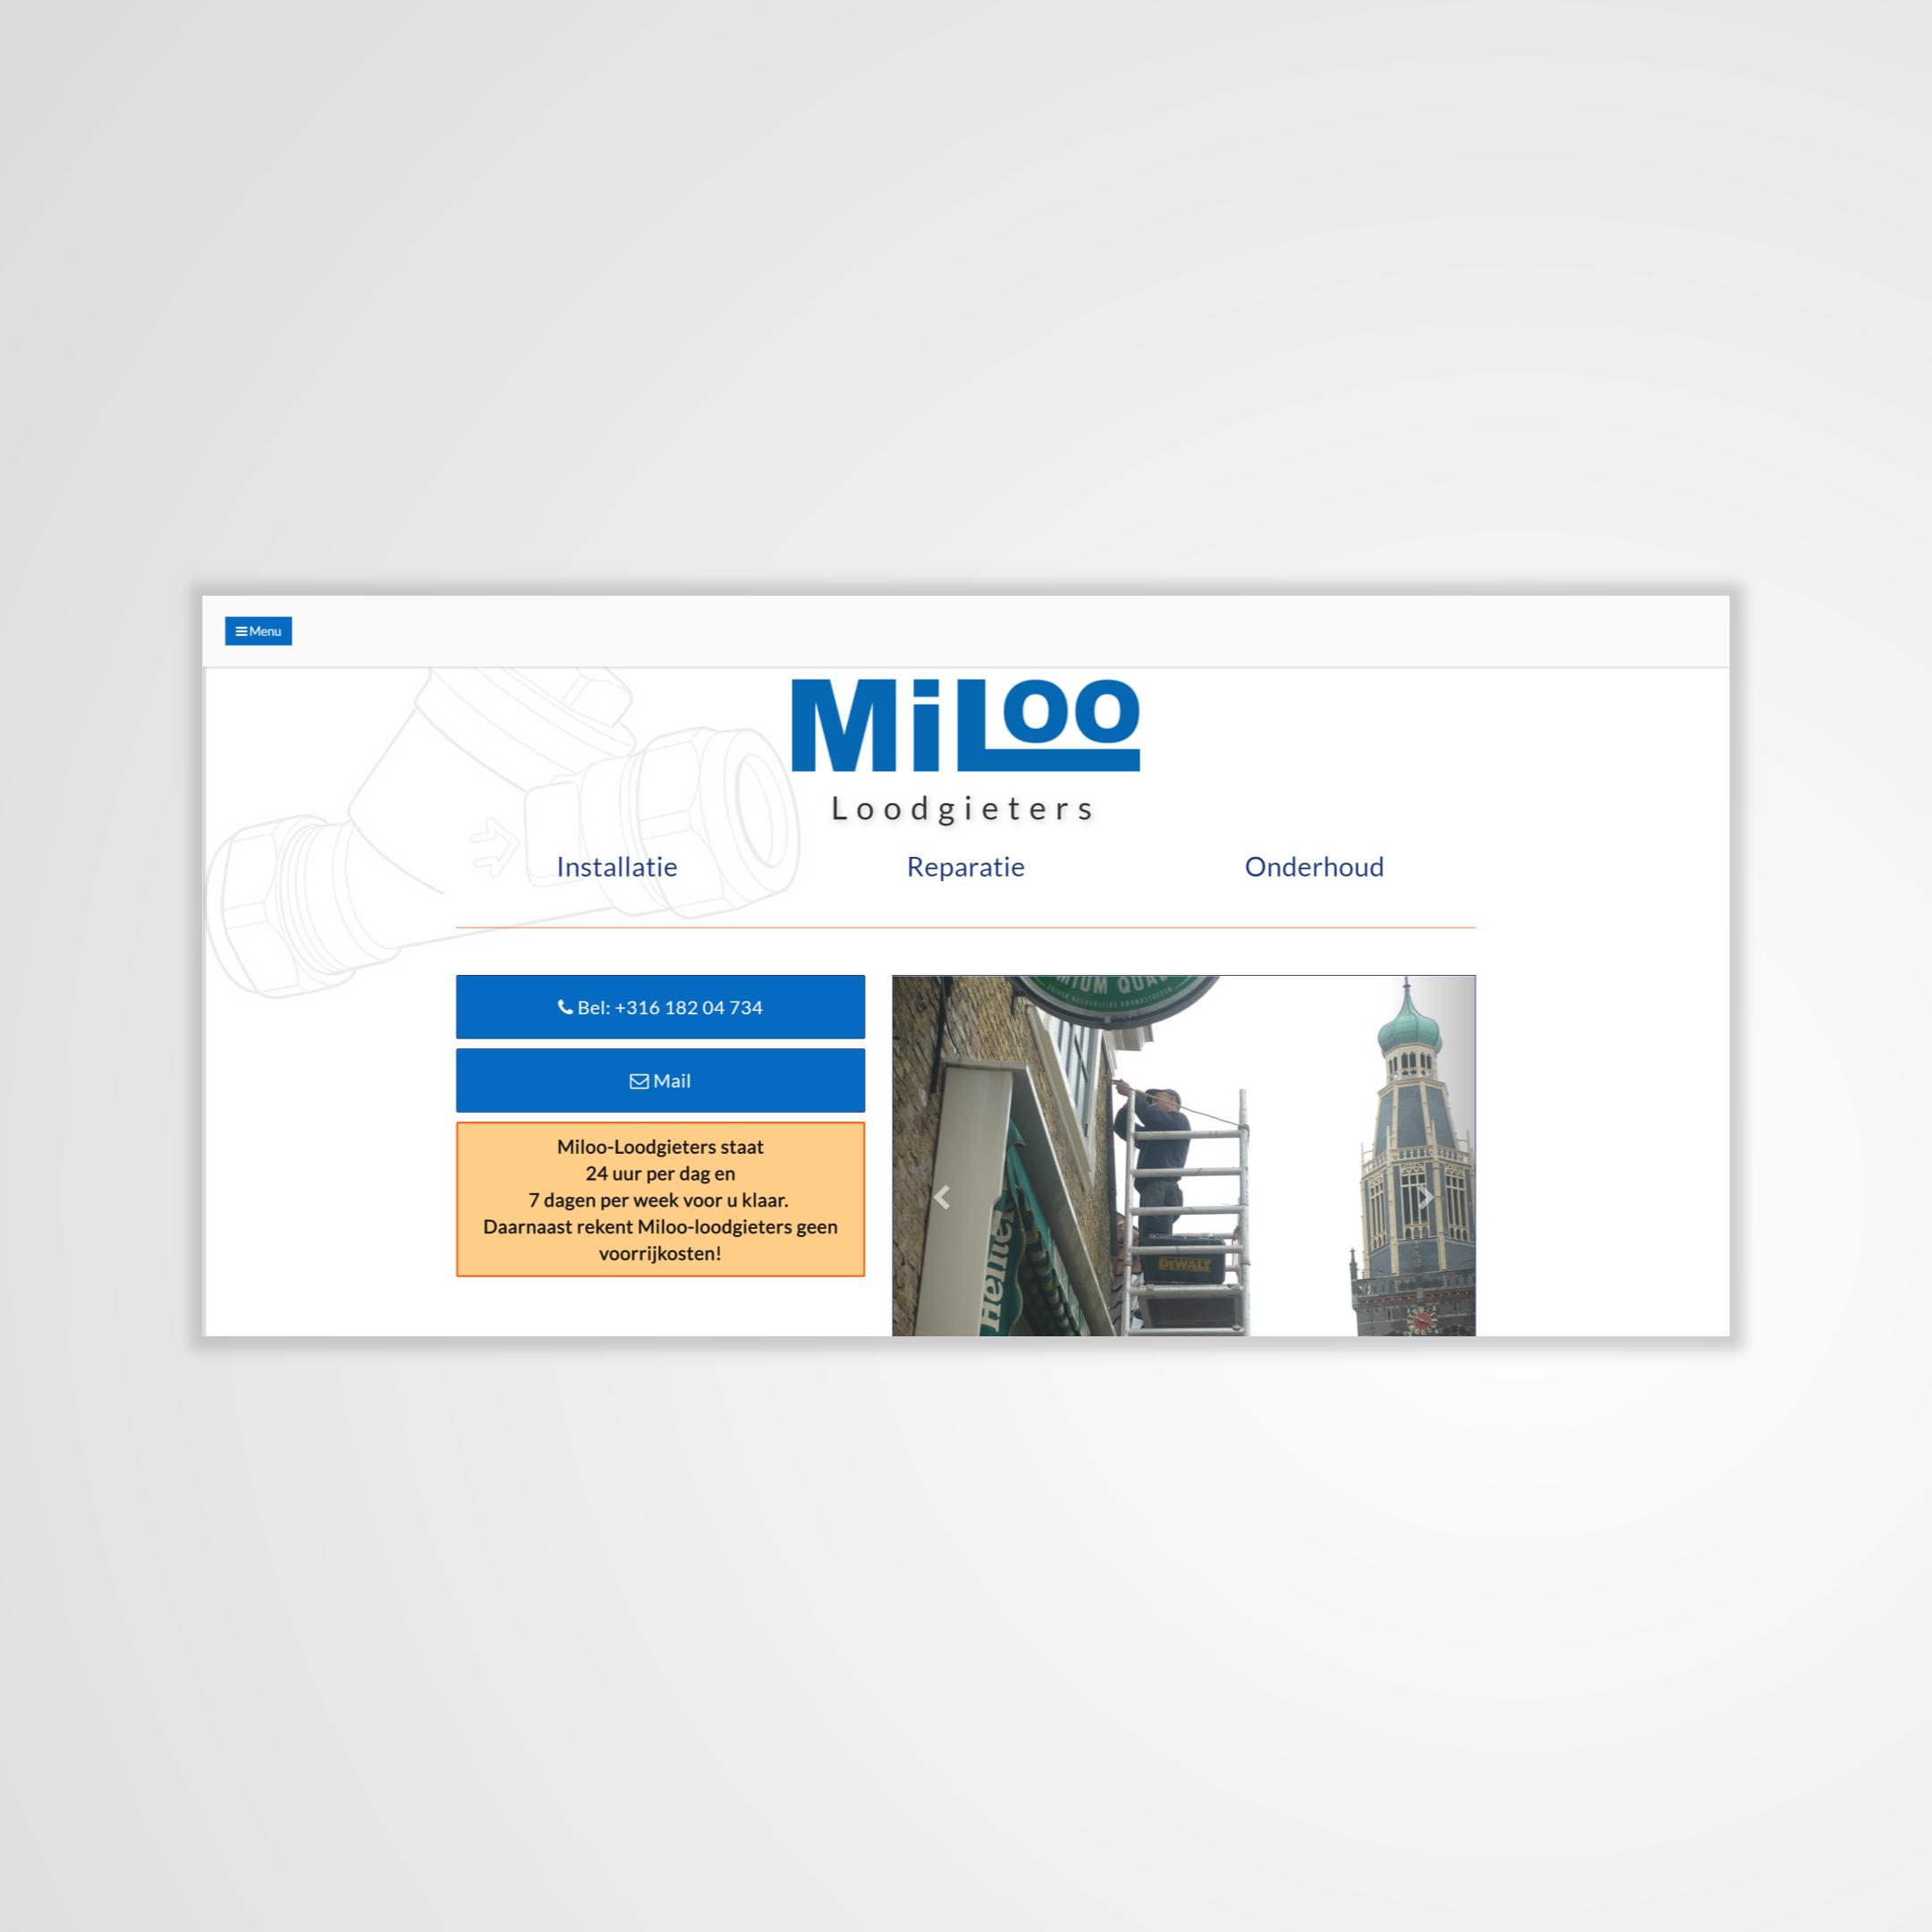 Miloo-Loodgieters